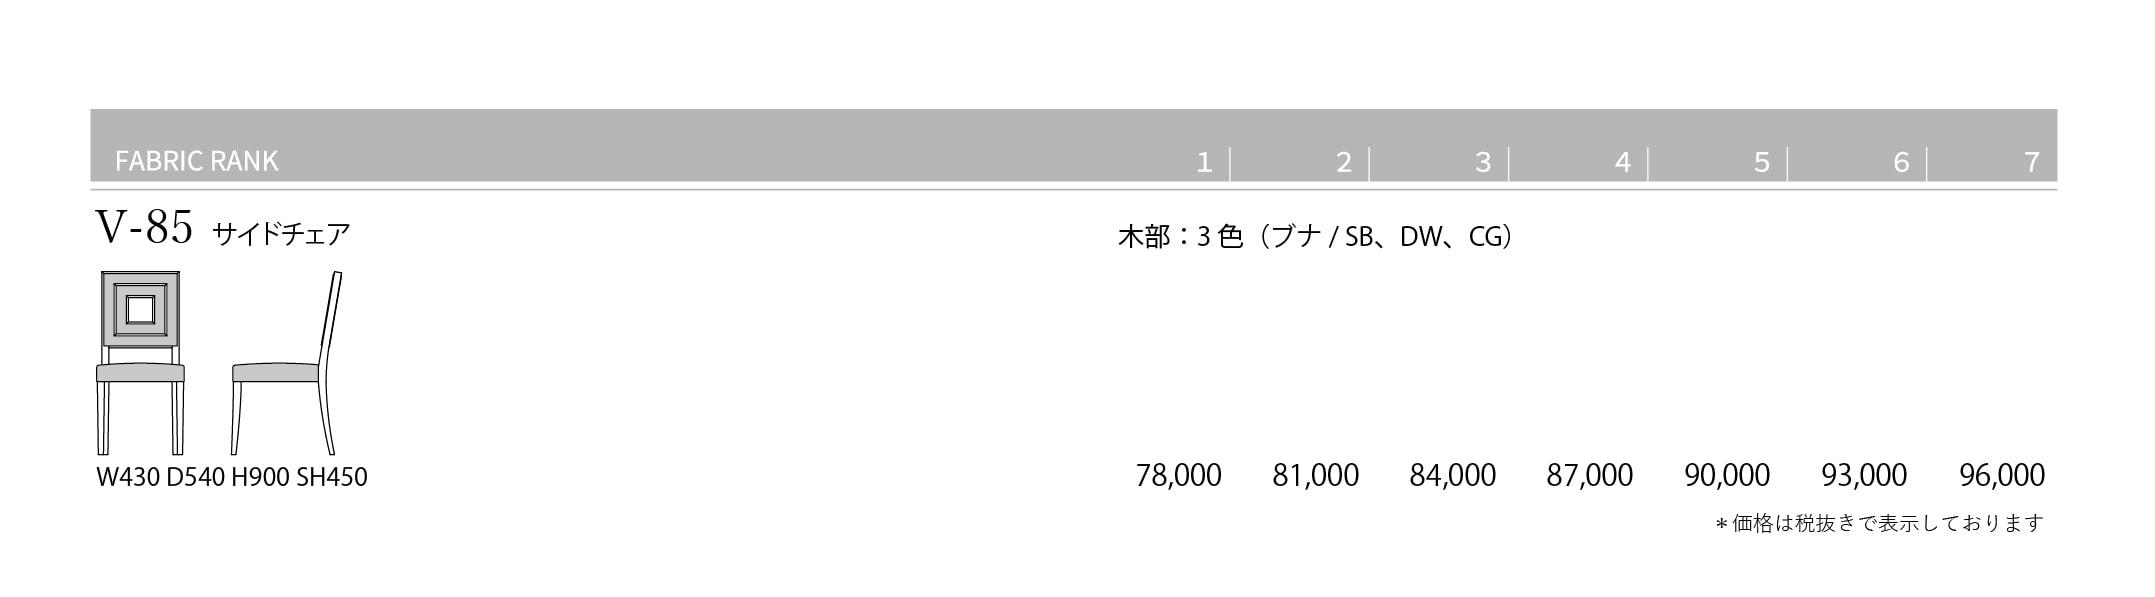 V-85 Price List